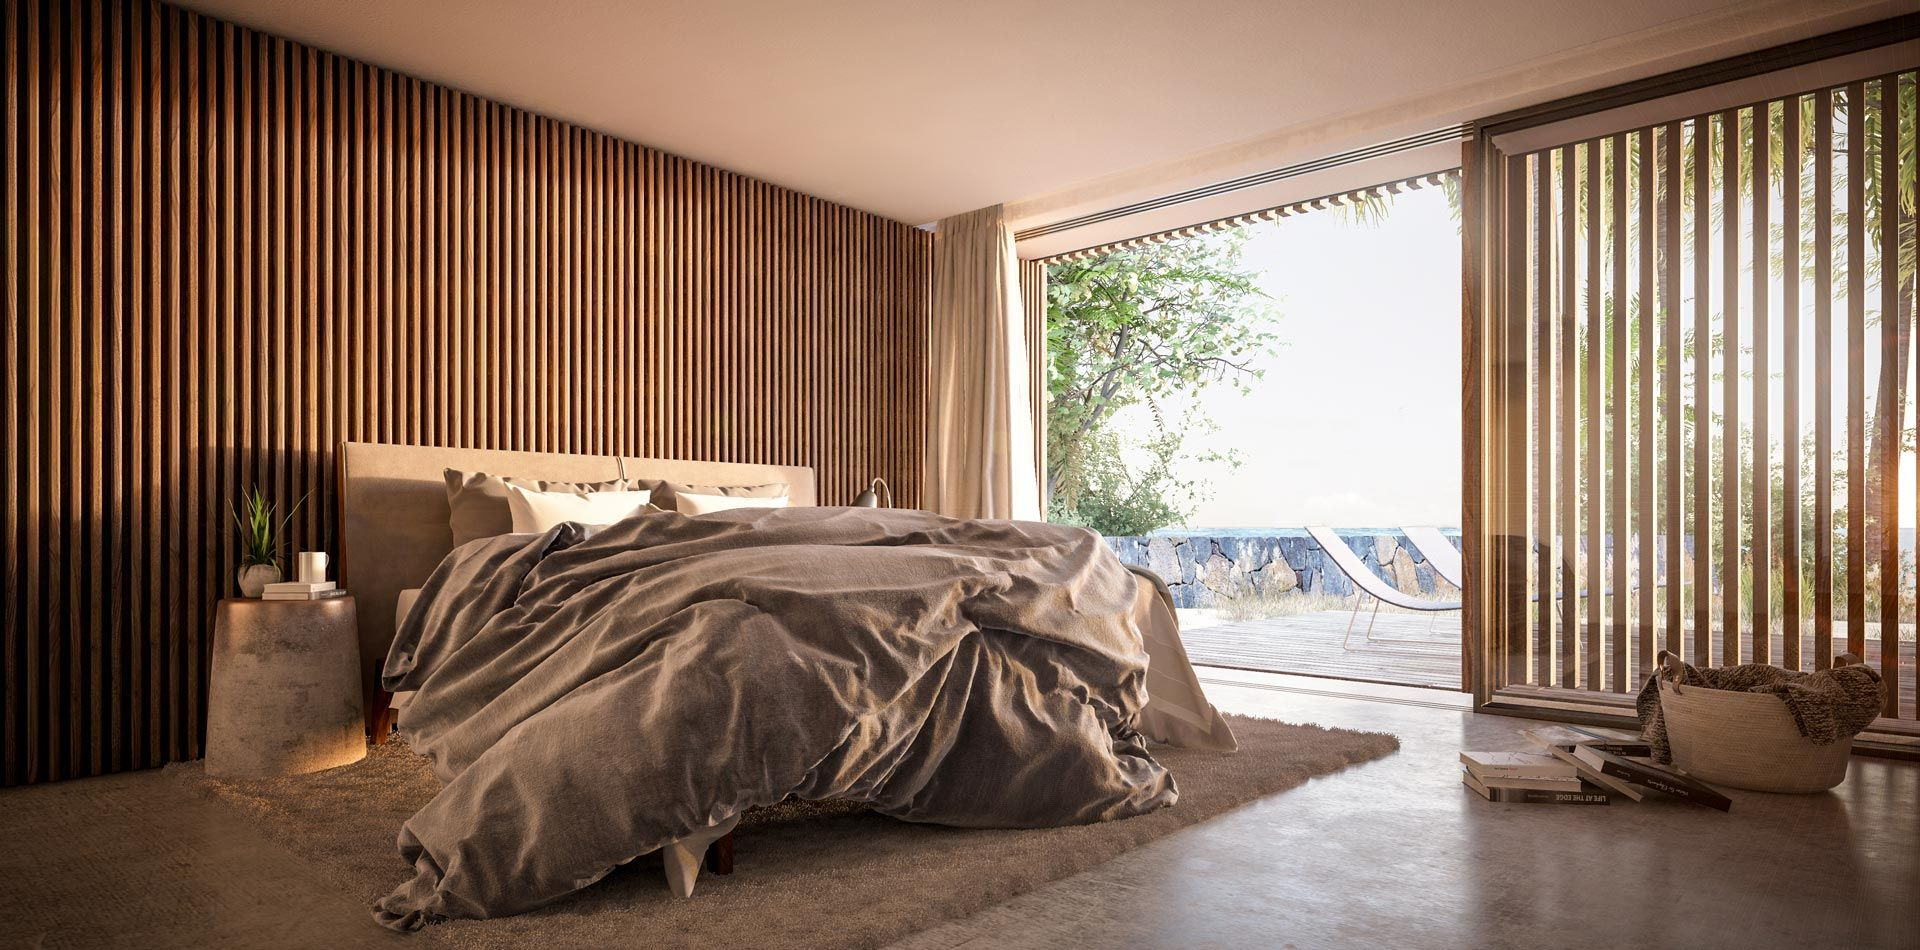 visualisation ds max terri brown architecture interior design vray mauritius east coast tropical luxury modern bedroom also rh pinterest